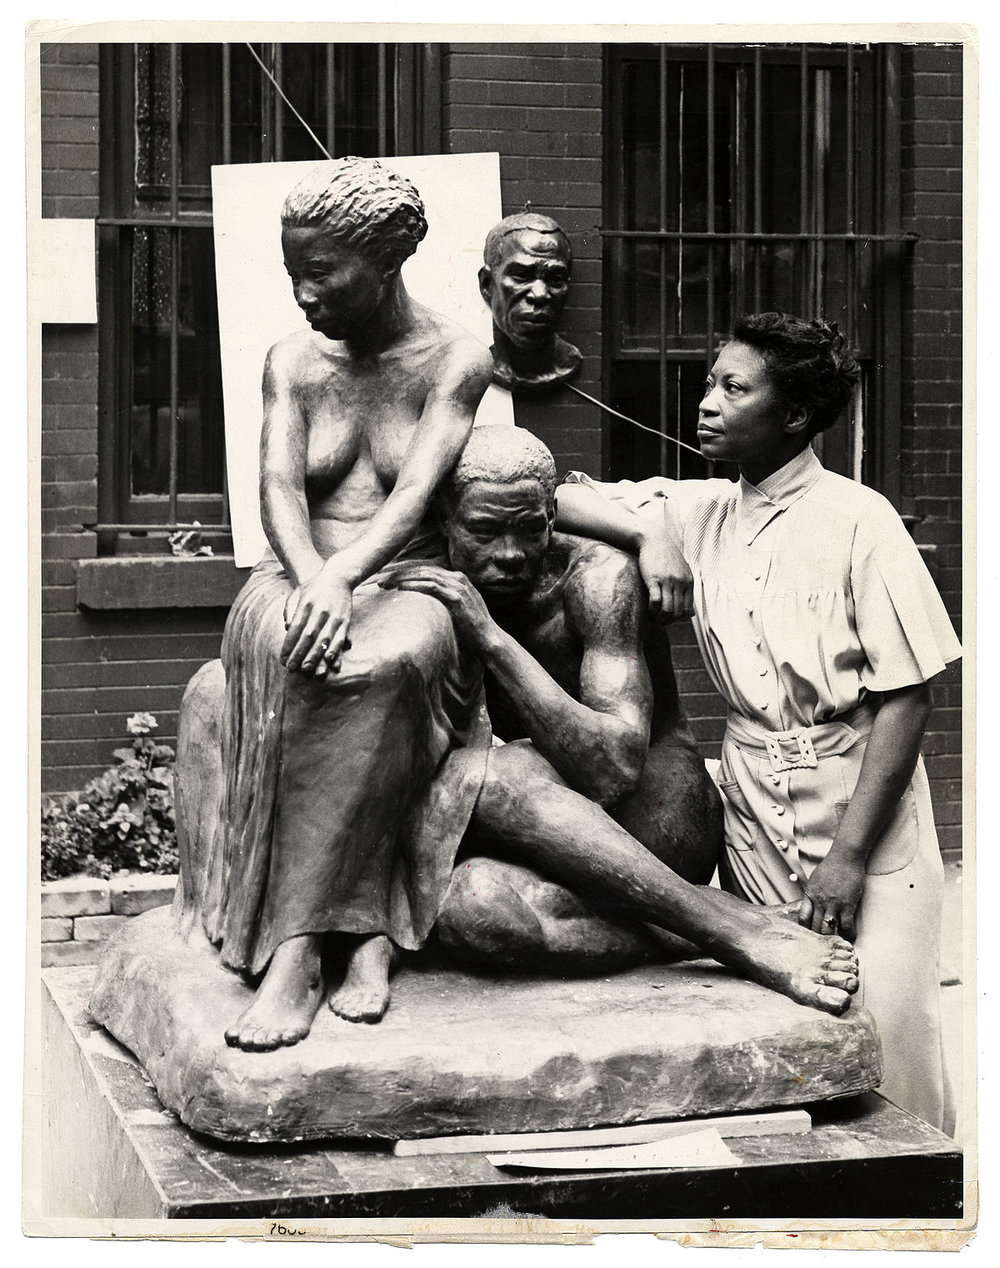 1200px-Archives_of_American_Art_-_Augusta_Savage_-_2371.jpg